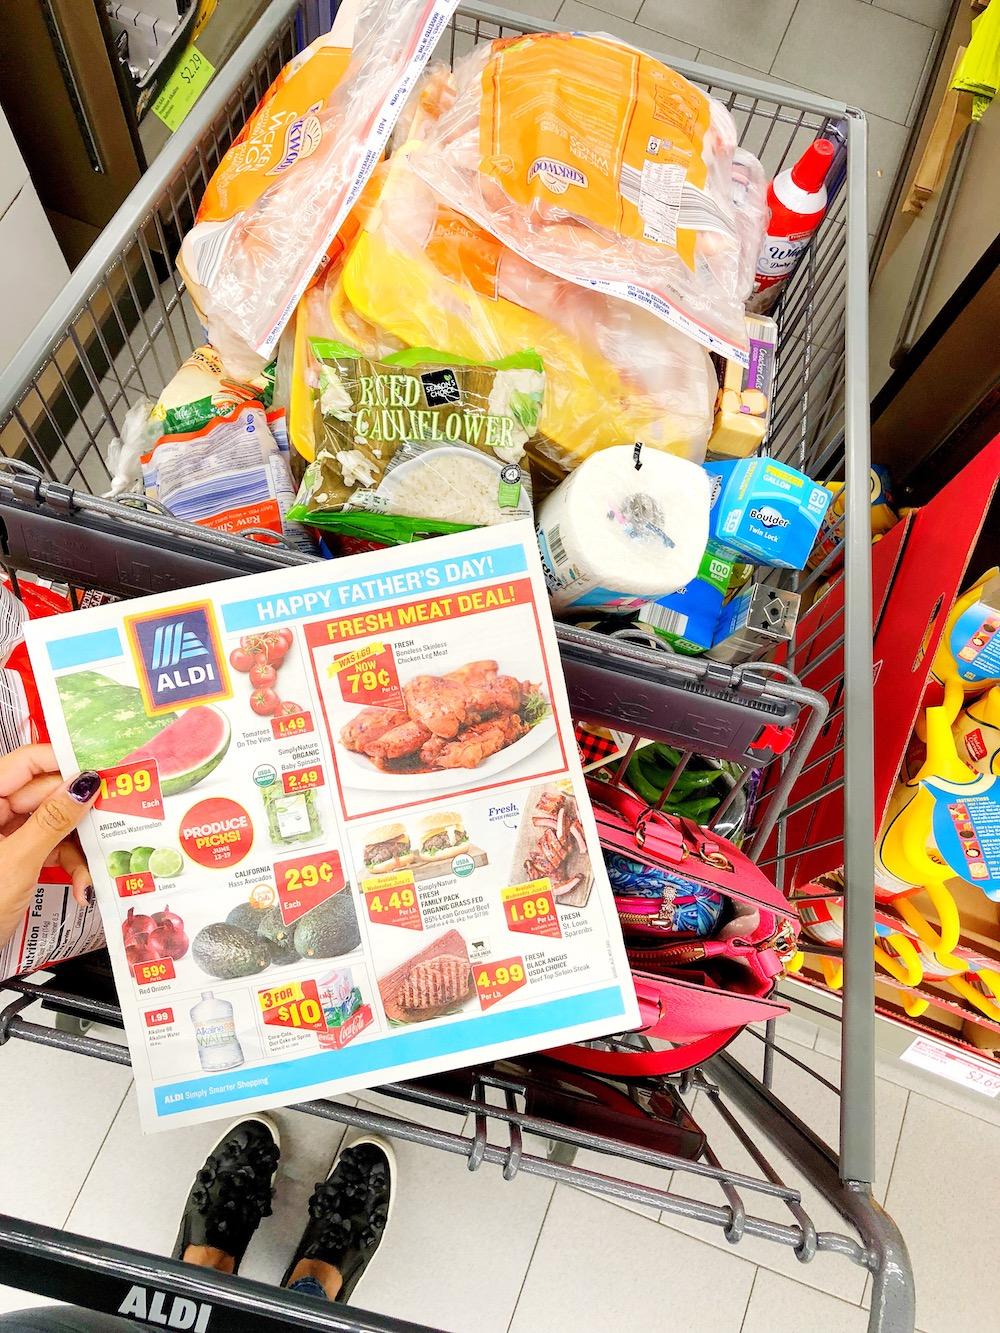 ALDI ad and keto food in grocery cart - livingmividaloca.com